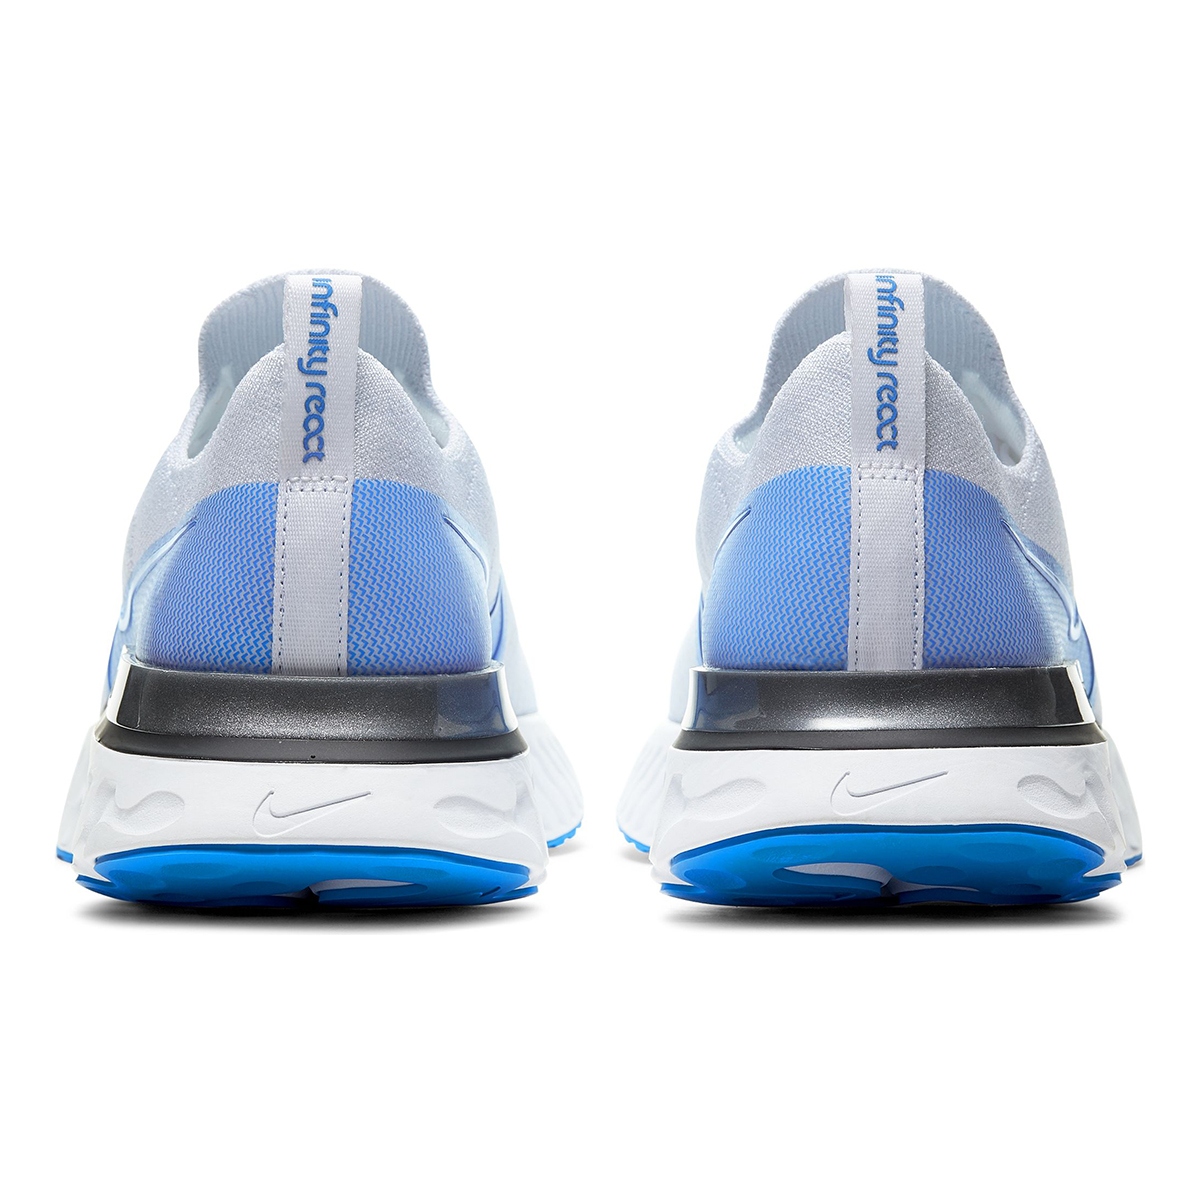 Men's Nike React Infinity Run Flyknit Running Shoe - Color: True White/White/Pure (Regular Width) - Size: 6, True White/White/Pure, large, image 3